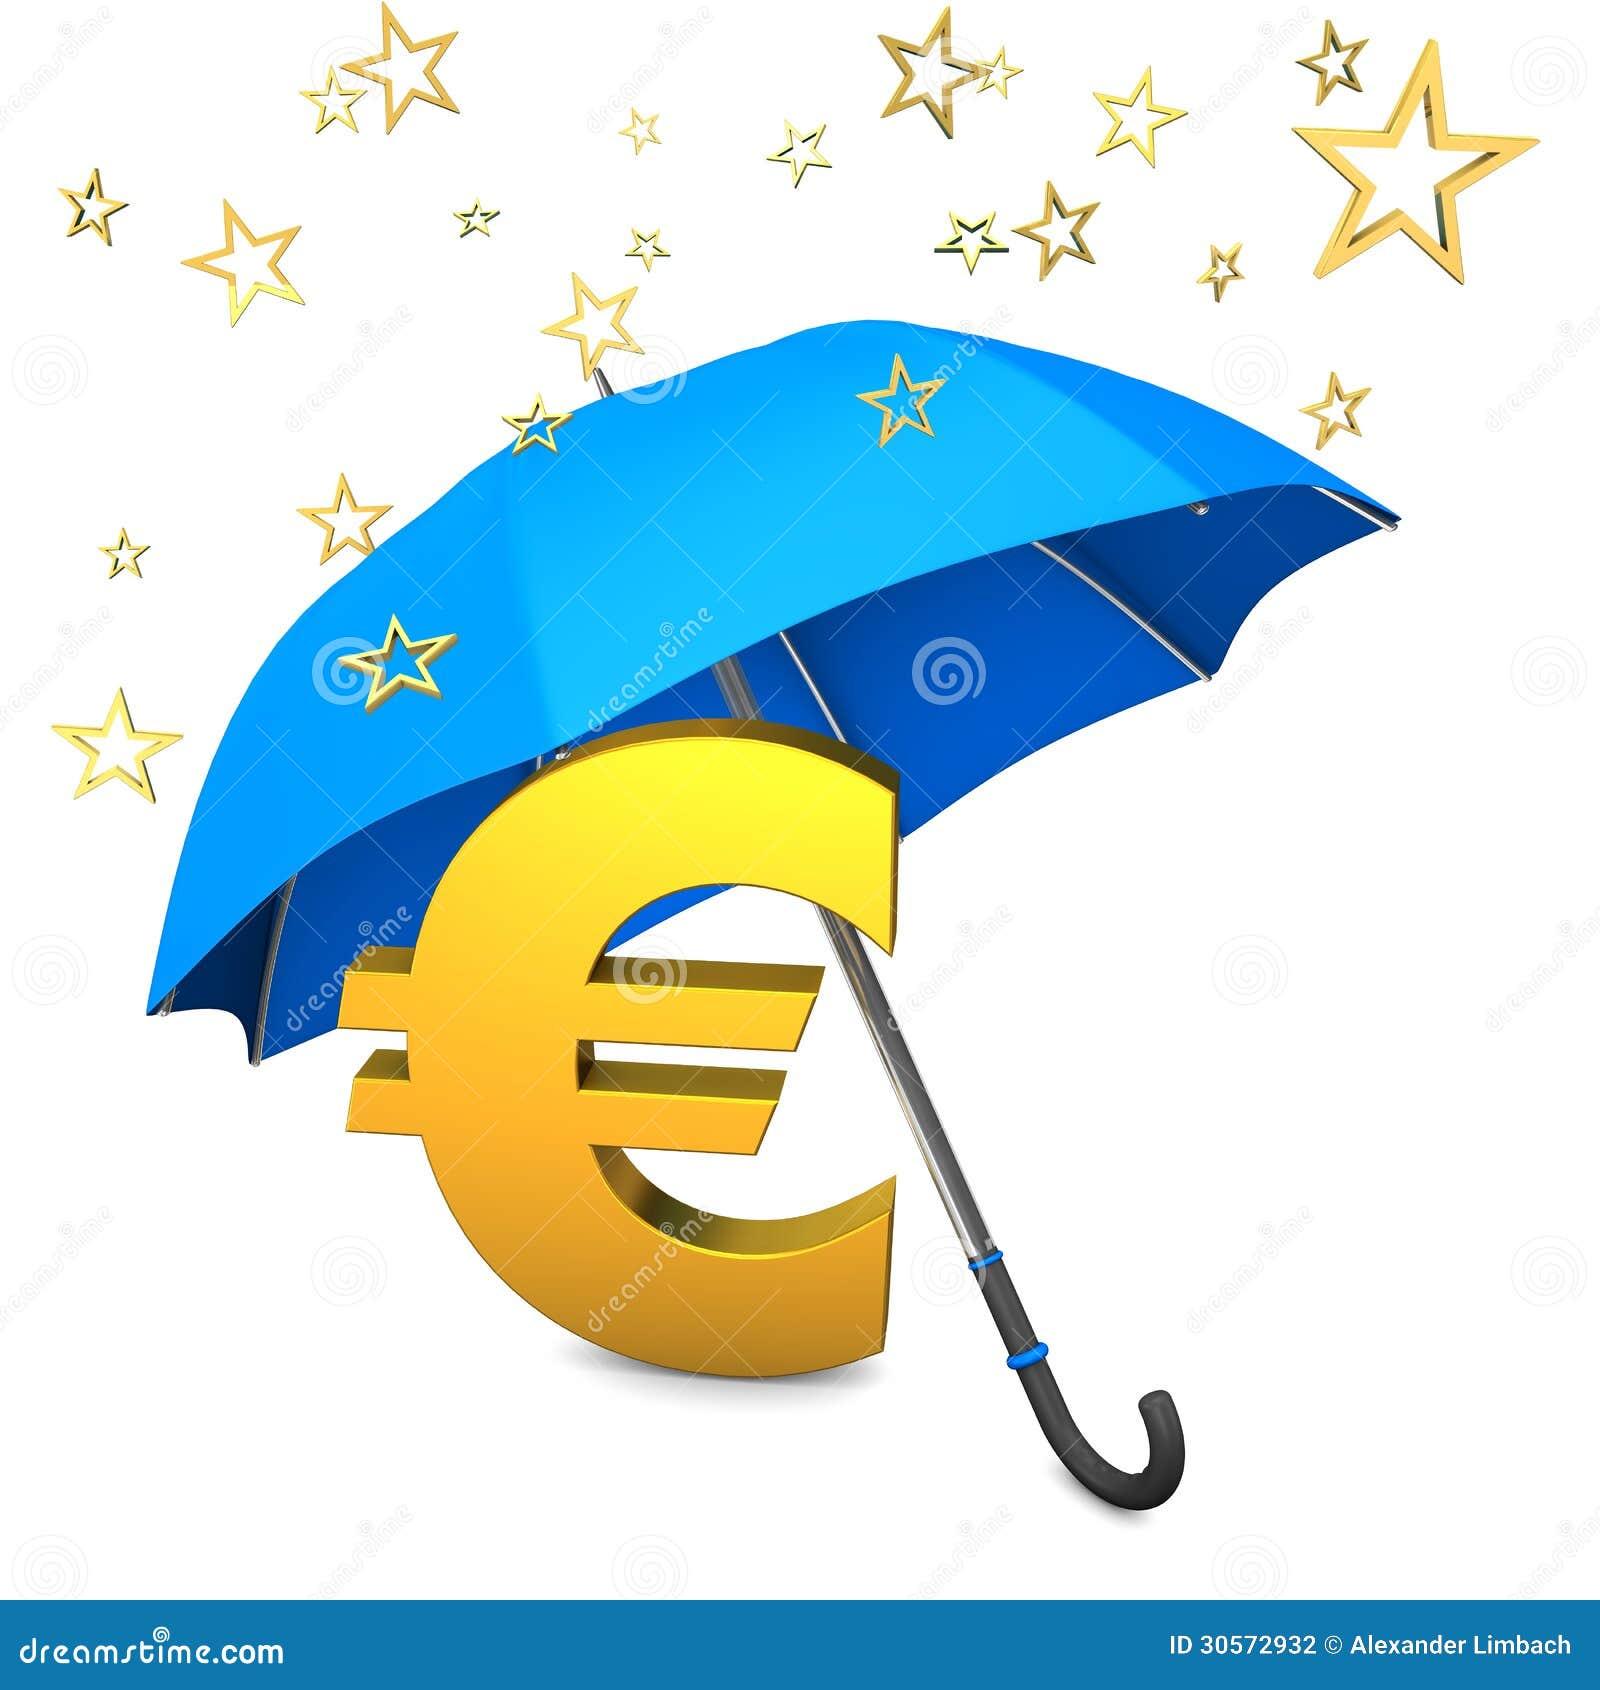 how to get the golden umbrella